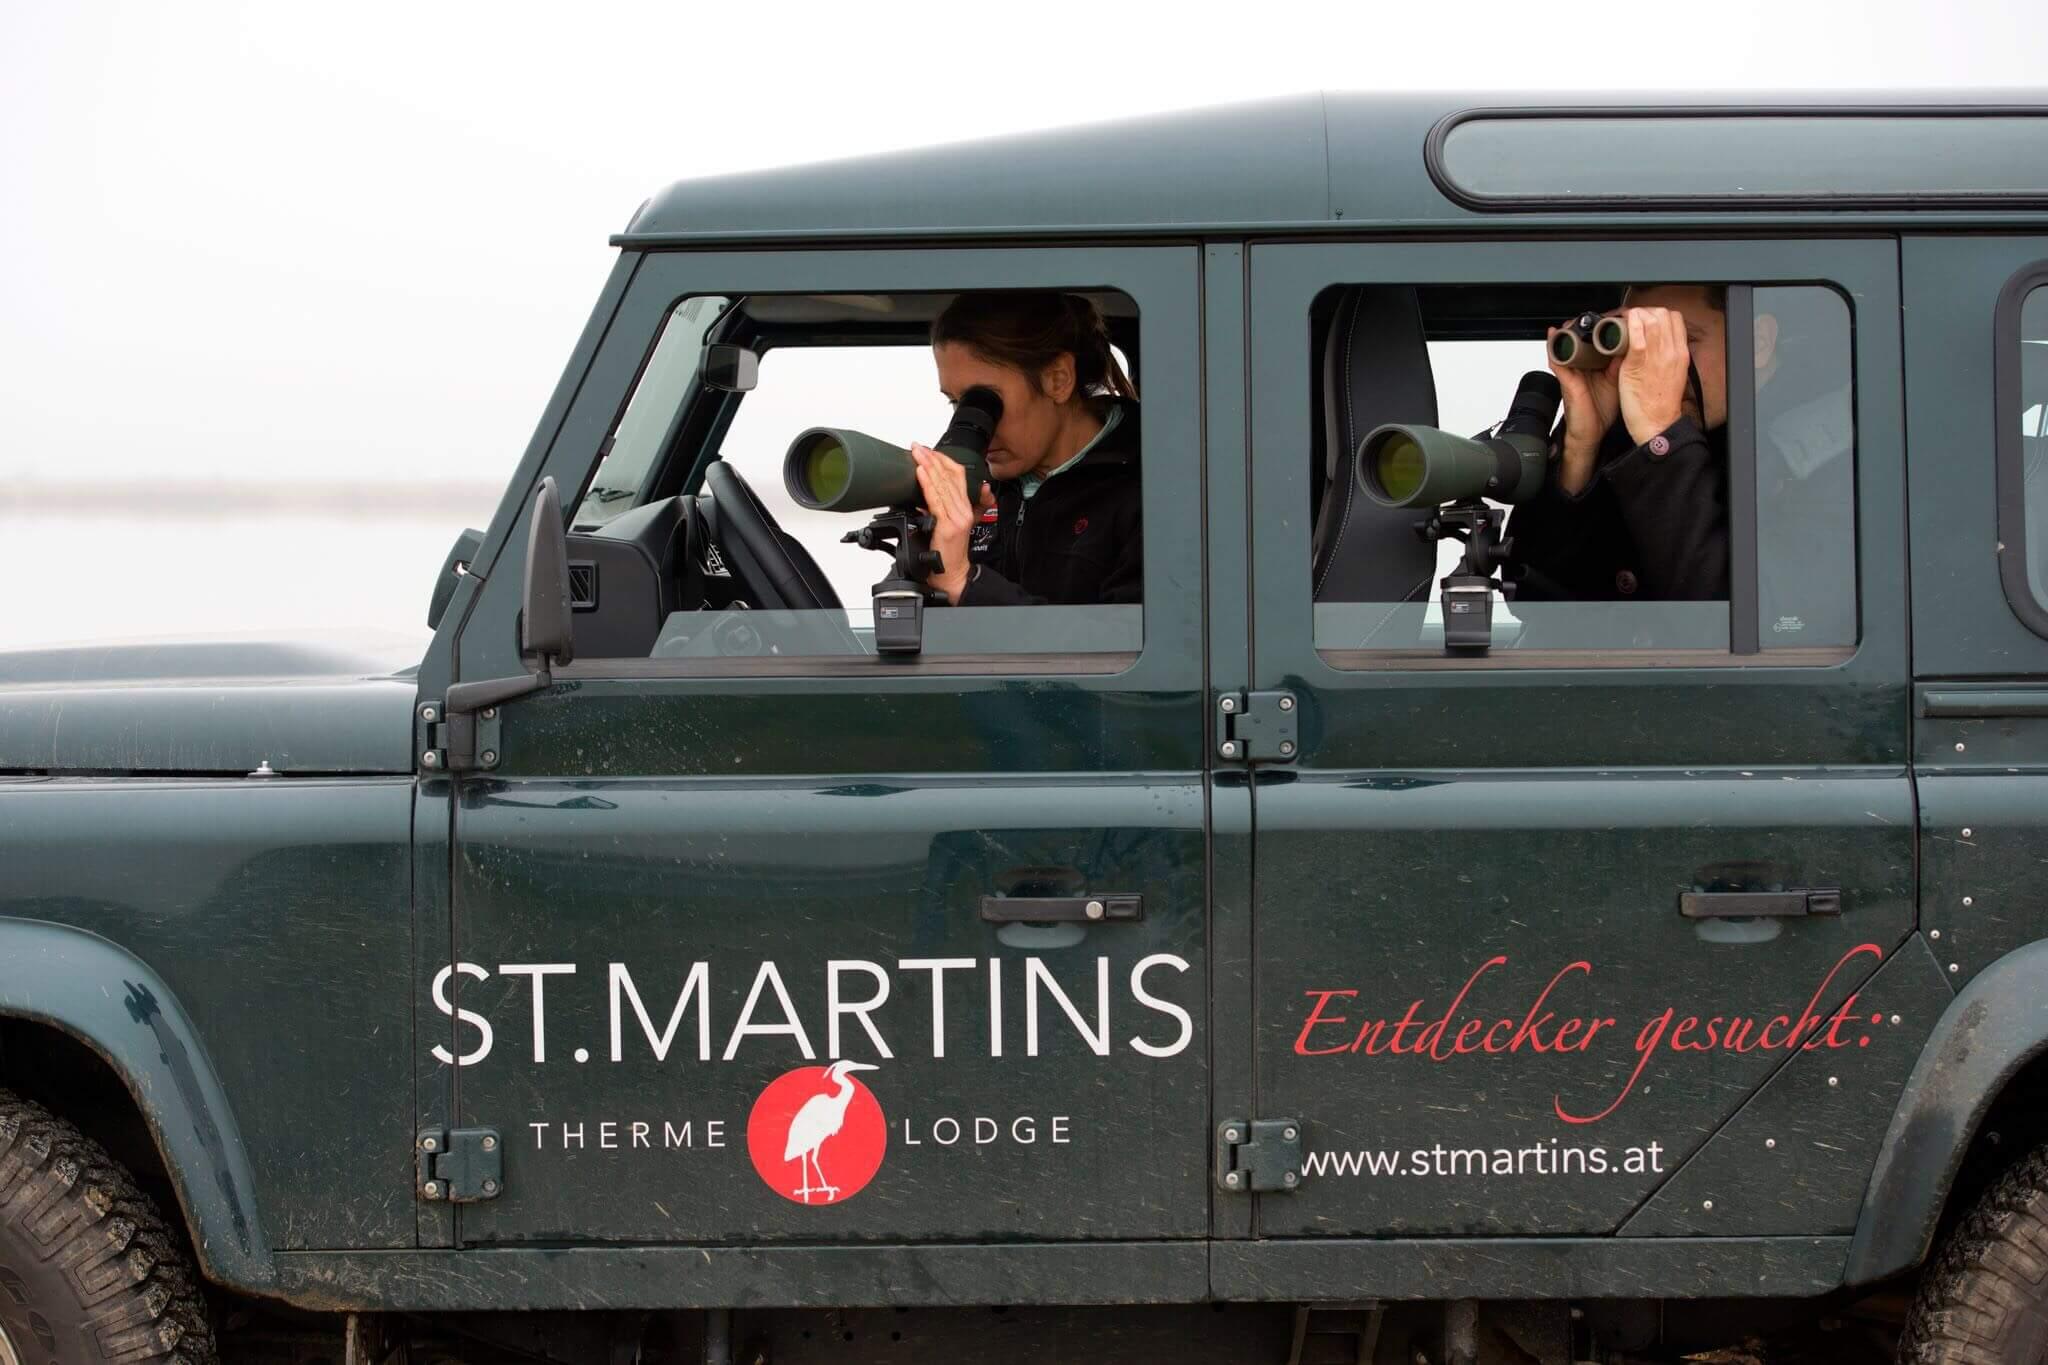 SPA-Urlaub in der St. Martins Therme & Lodge - Gerid Rux